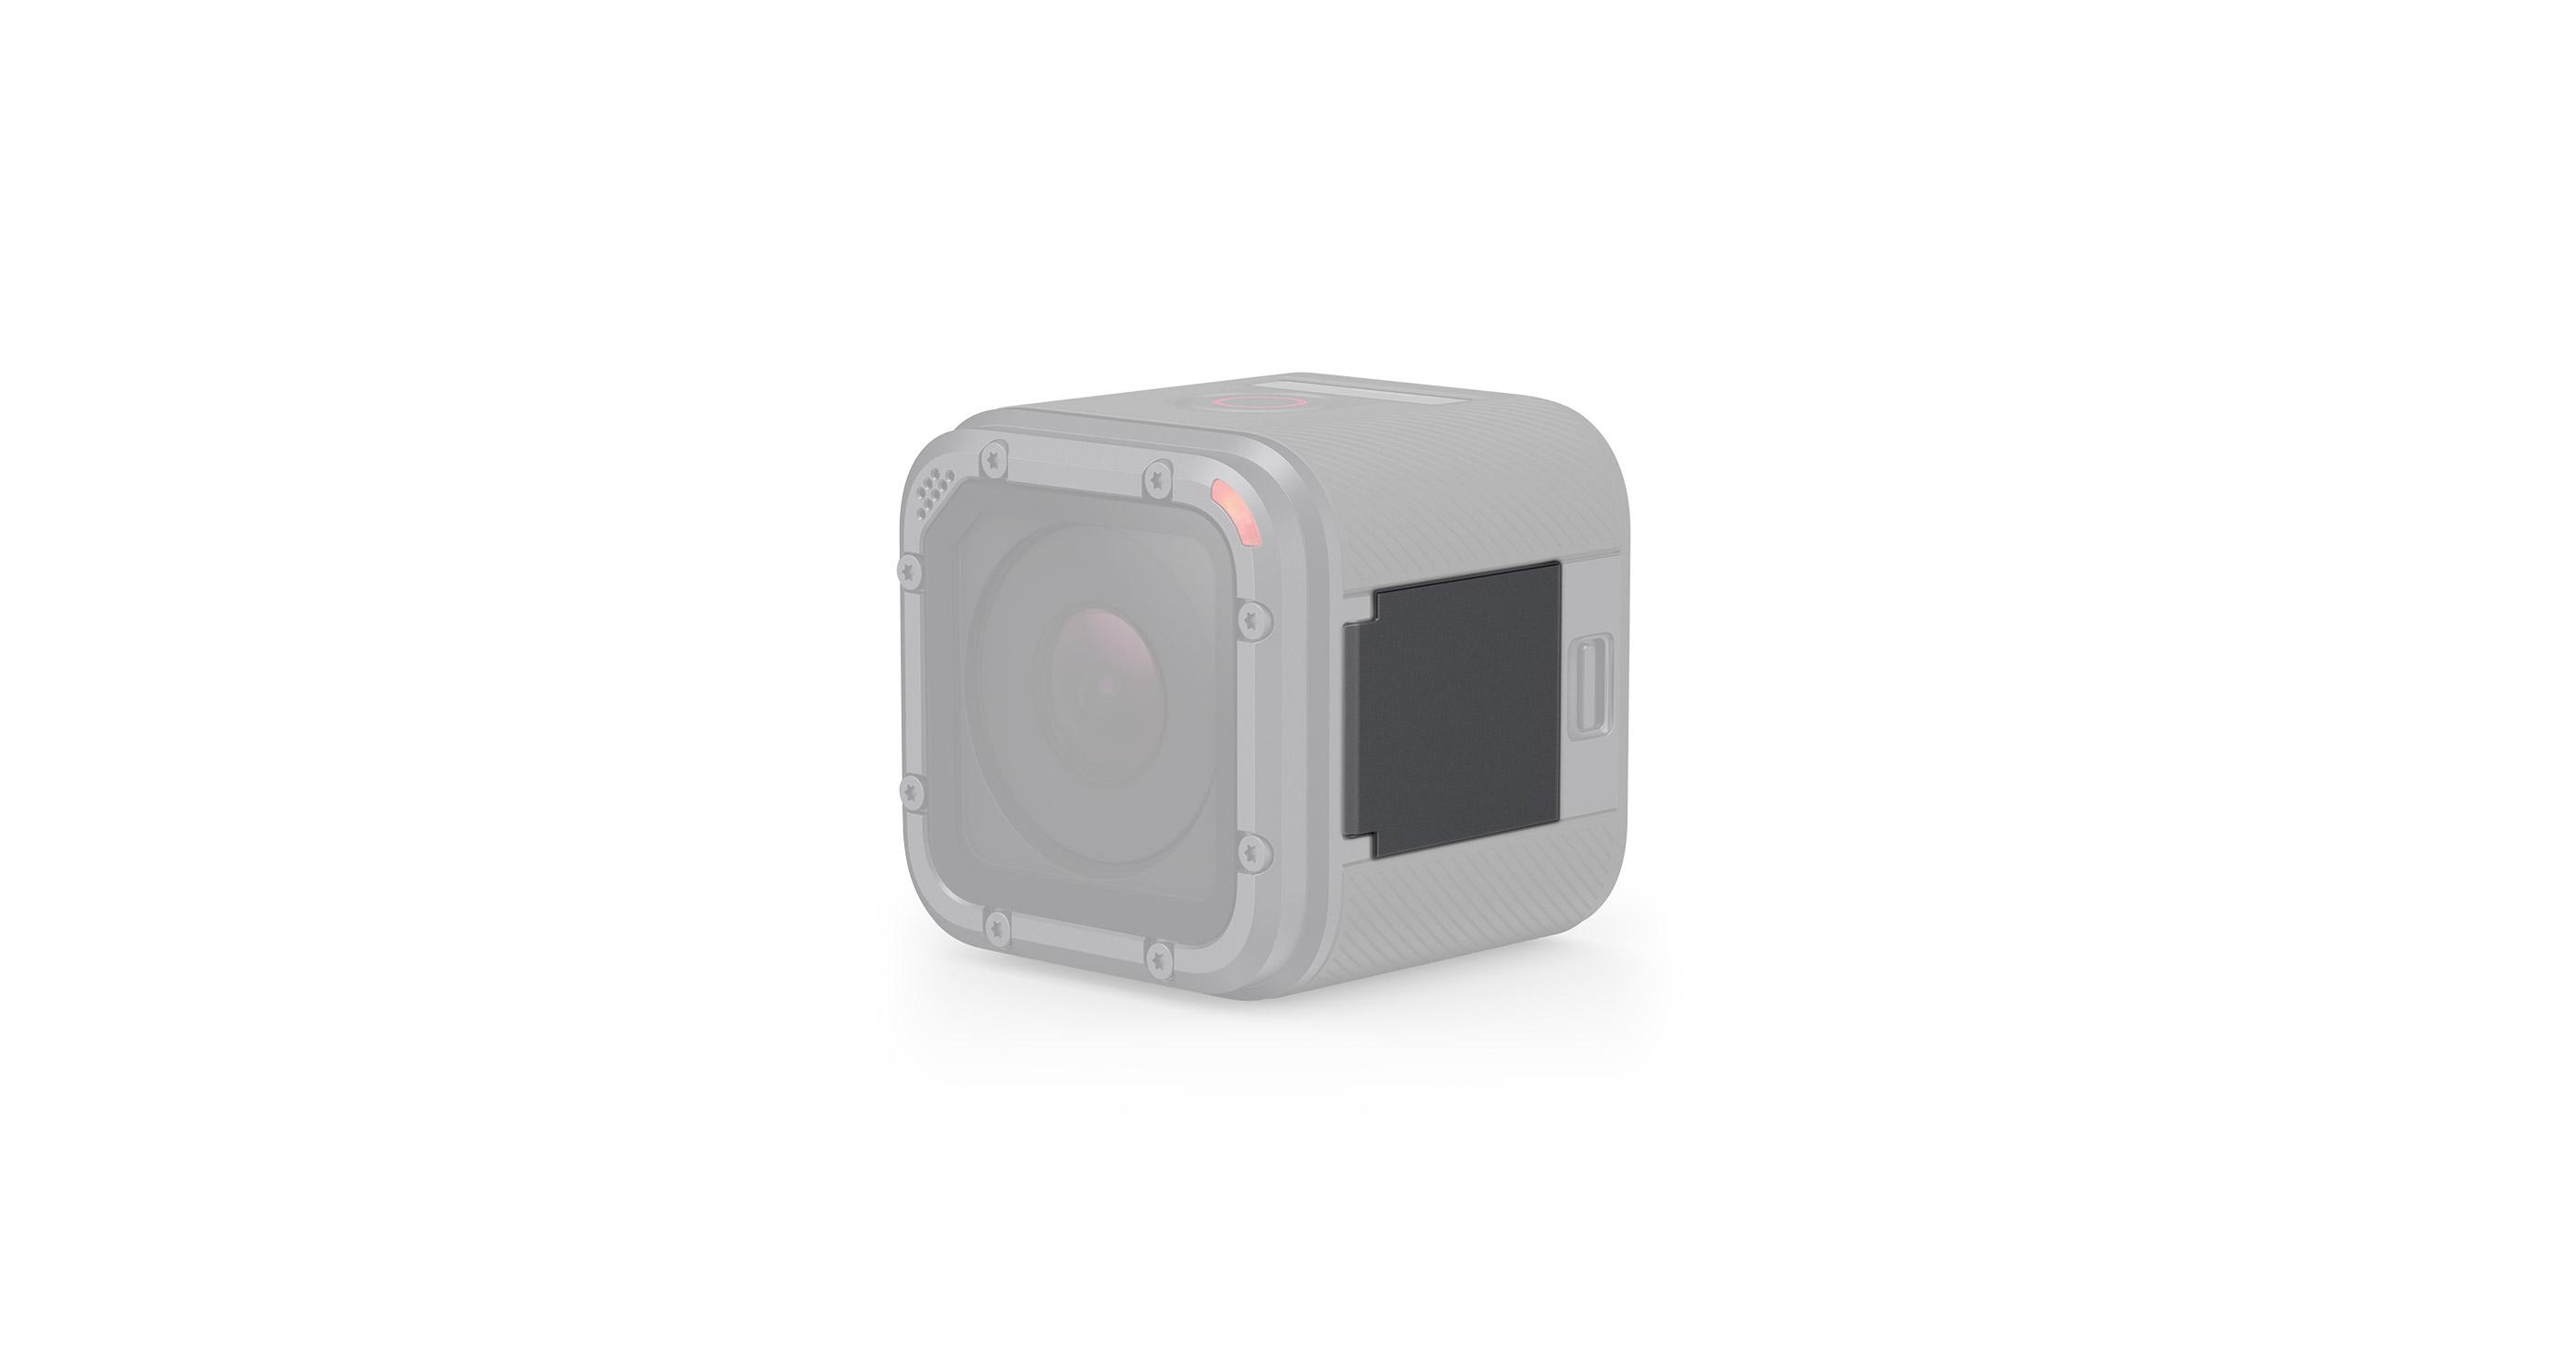 [GoPro] 교체용 도어(HERO5 Session™용) (GO593)